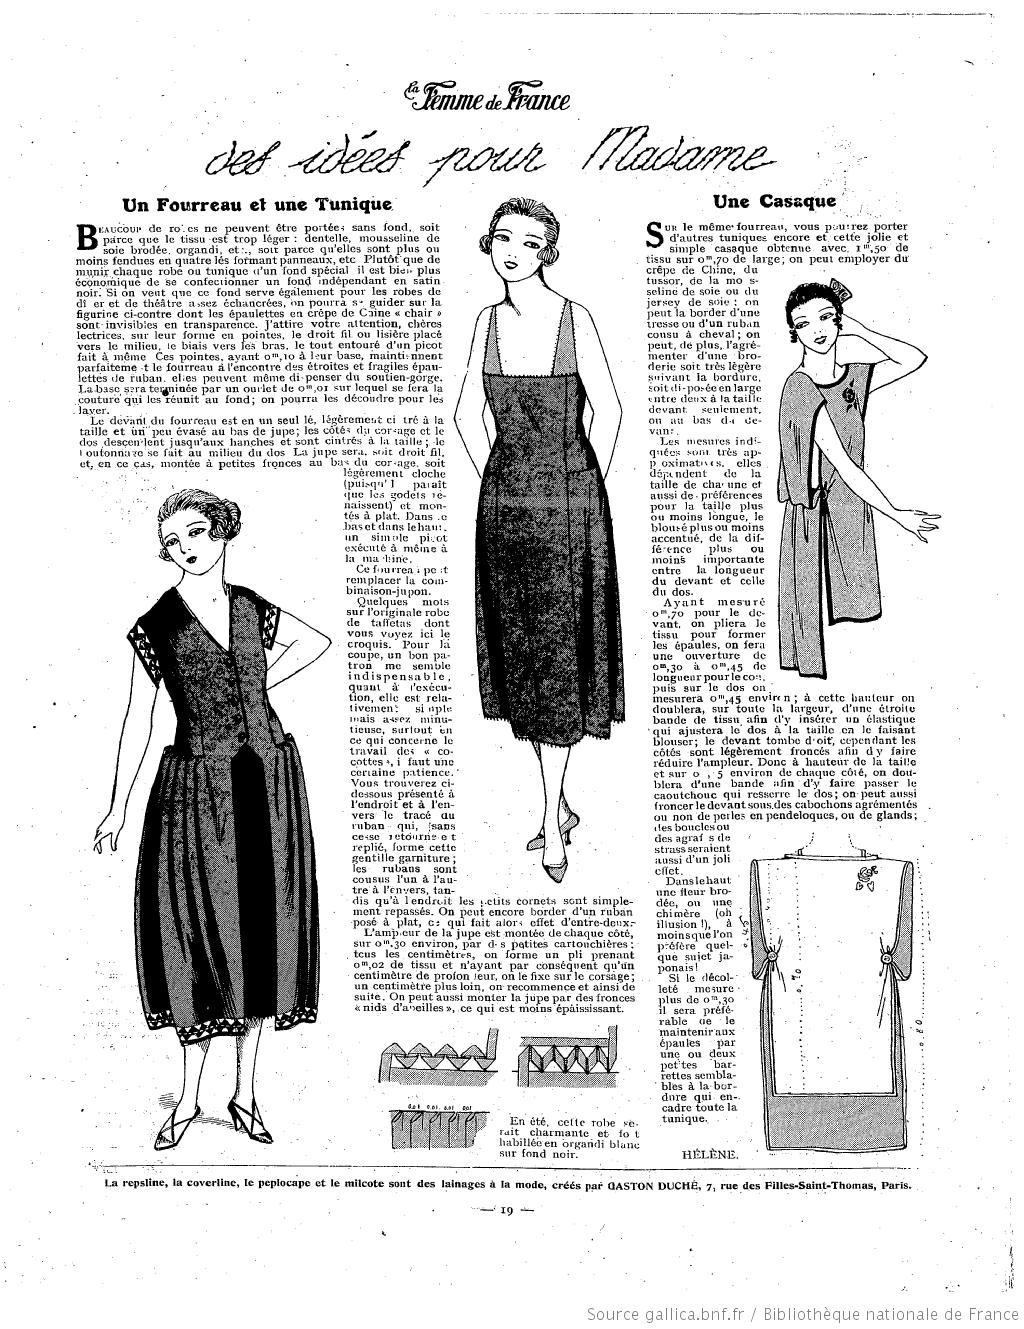 La Femme de France 1921/04/03 | 1920 patterns | Pinterest | Moda ...